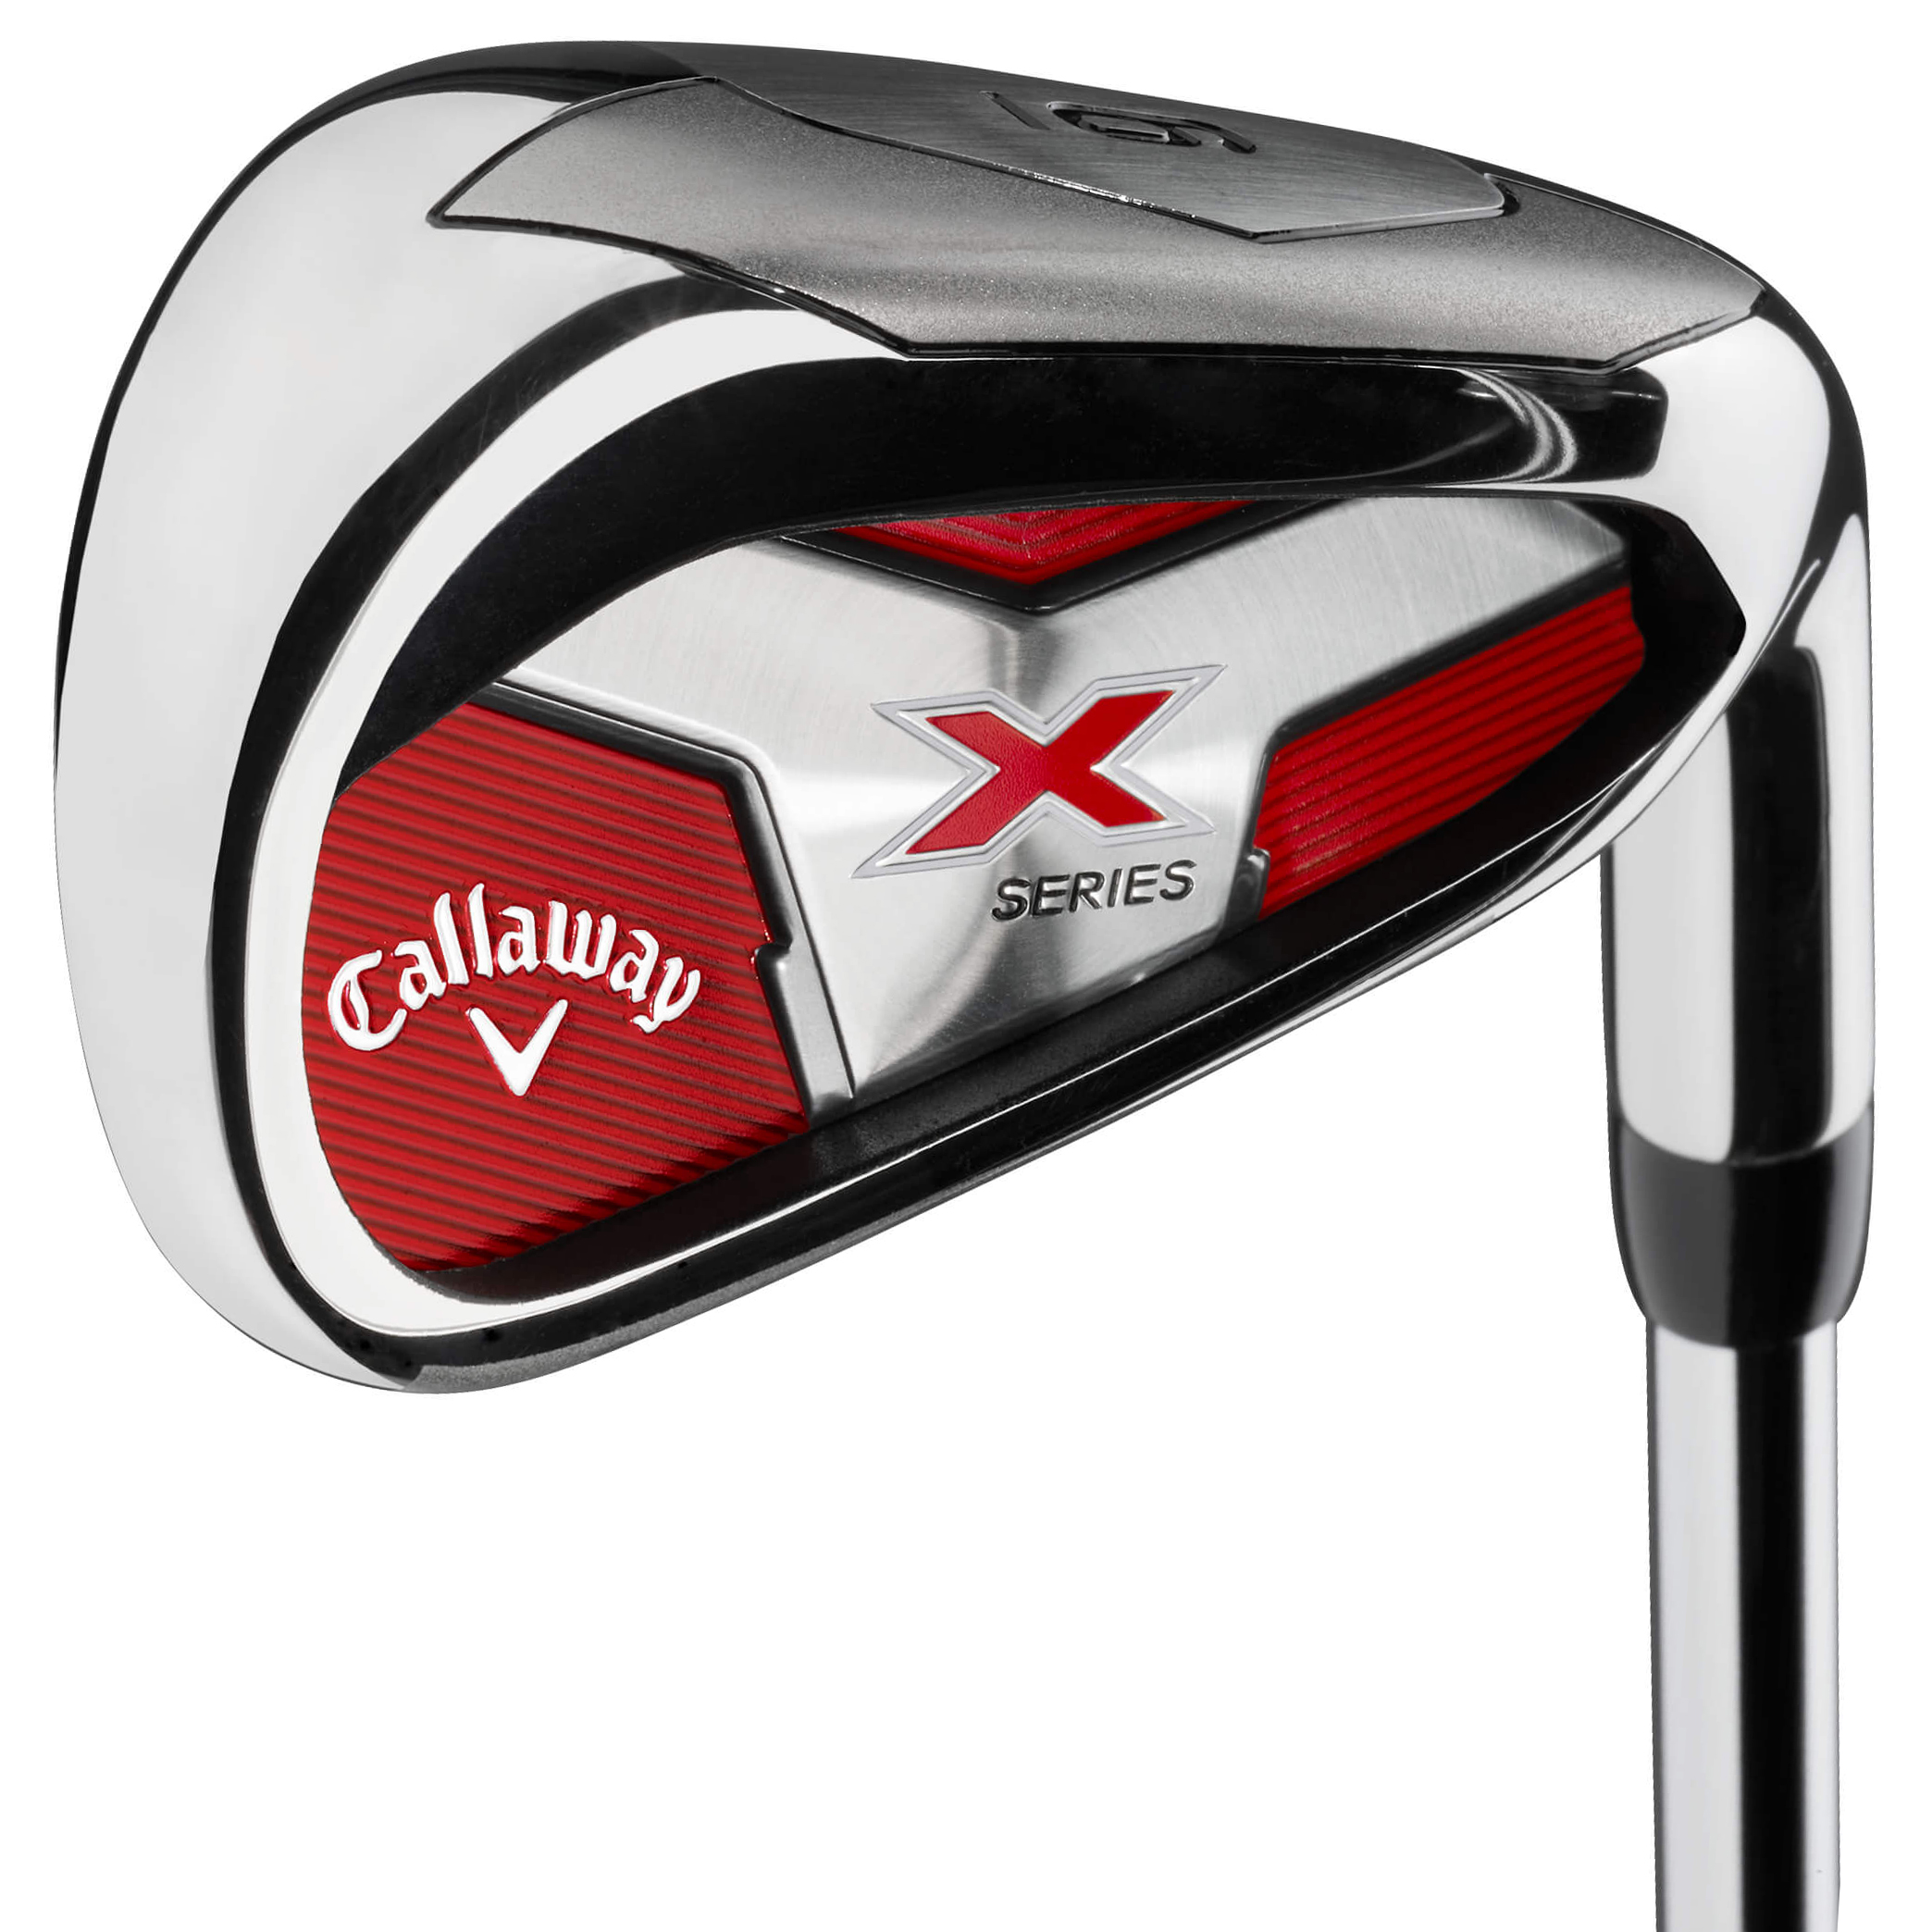 Callaway Golf Clubs >> Callaway Golf X Series 18 Iron Set 4 Pw Steel Uni Flex Shafts Ebay